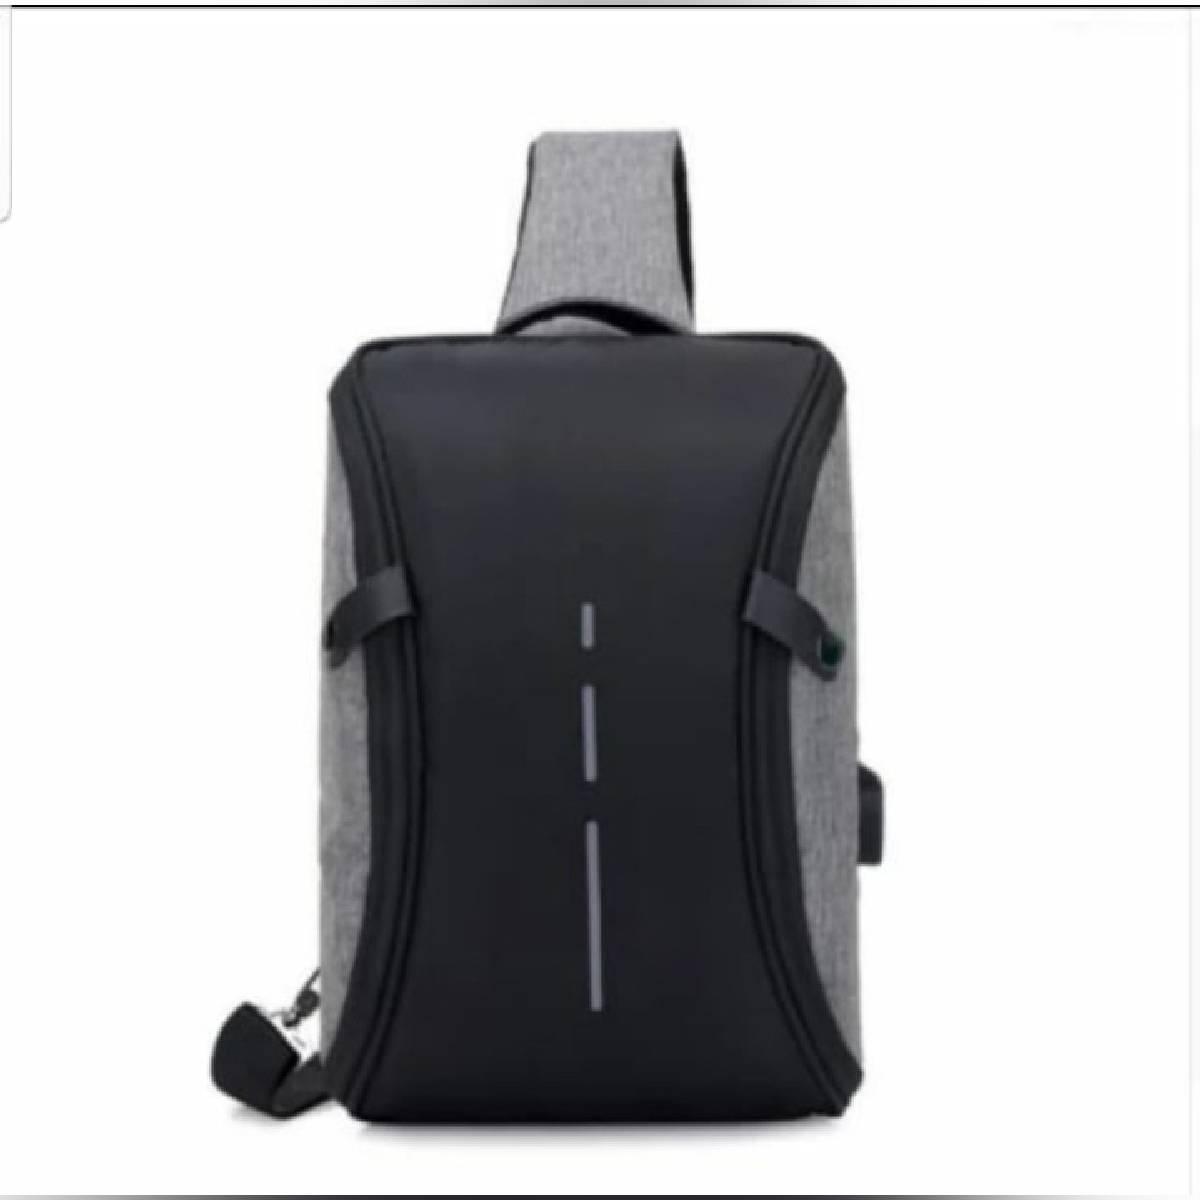 Man's Messenger Bag Men Shoulder PU Leather Chest Bags Crossbody Business Messenger Bags Male Charging Handbag with USB Charge